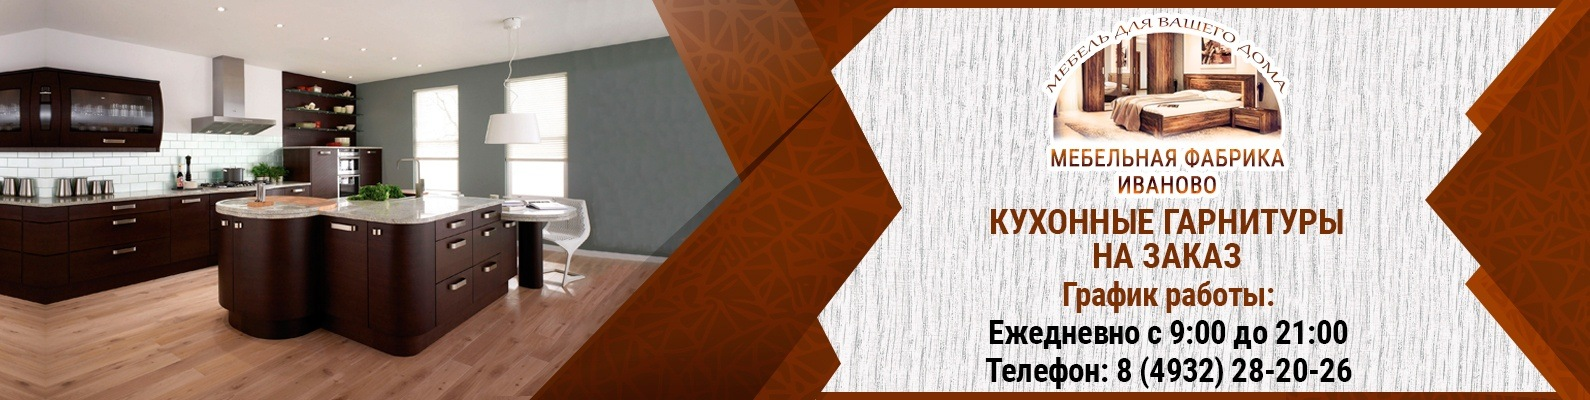 a99f5d264c25 Кухни/Мебель на Заказ Иваново! Заходите в группу | ВКонтакте